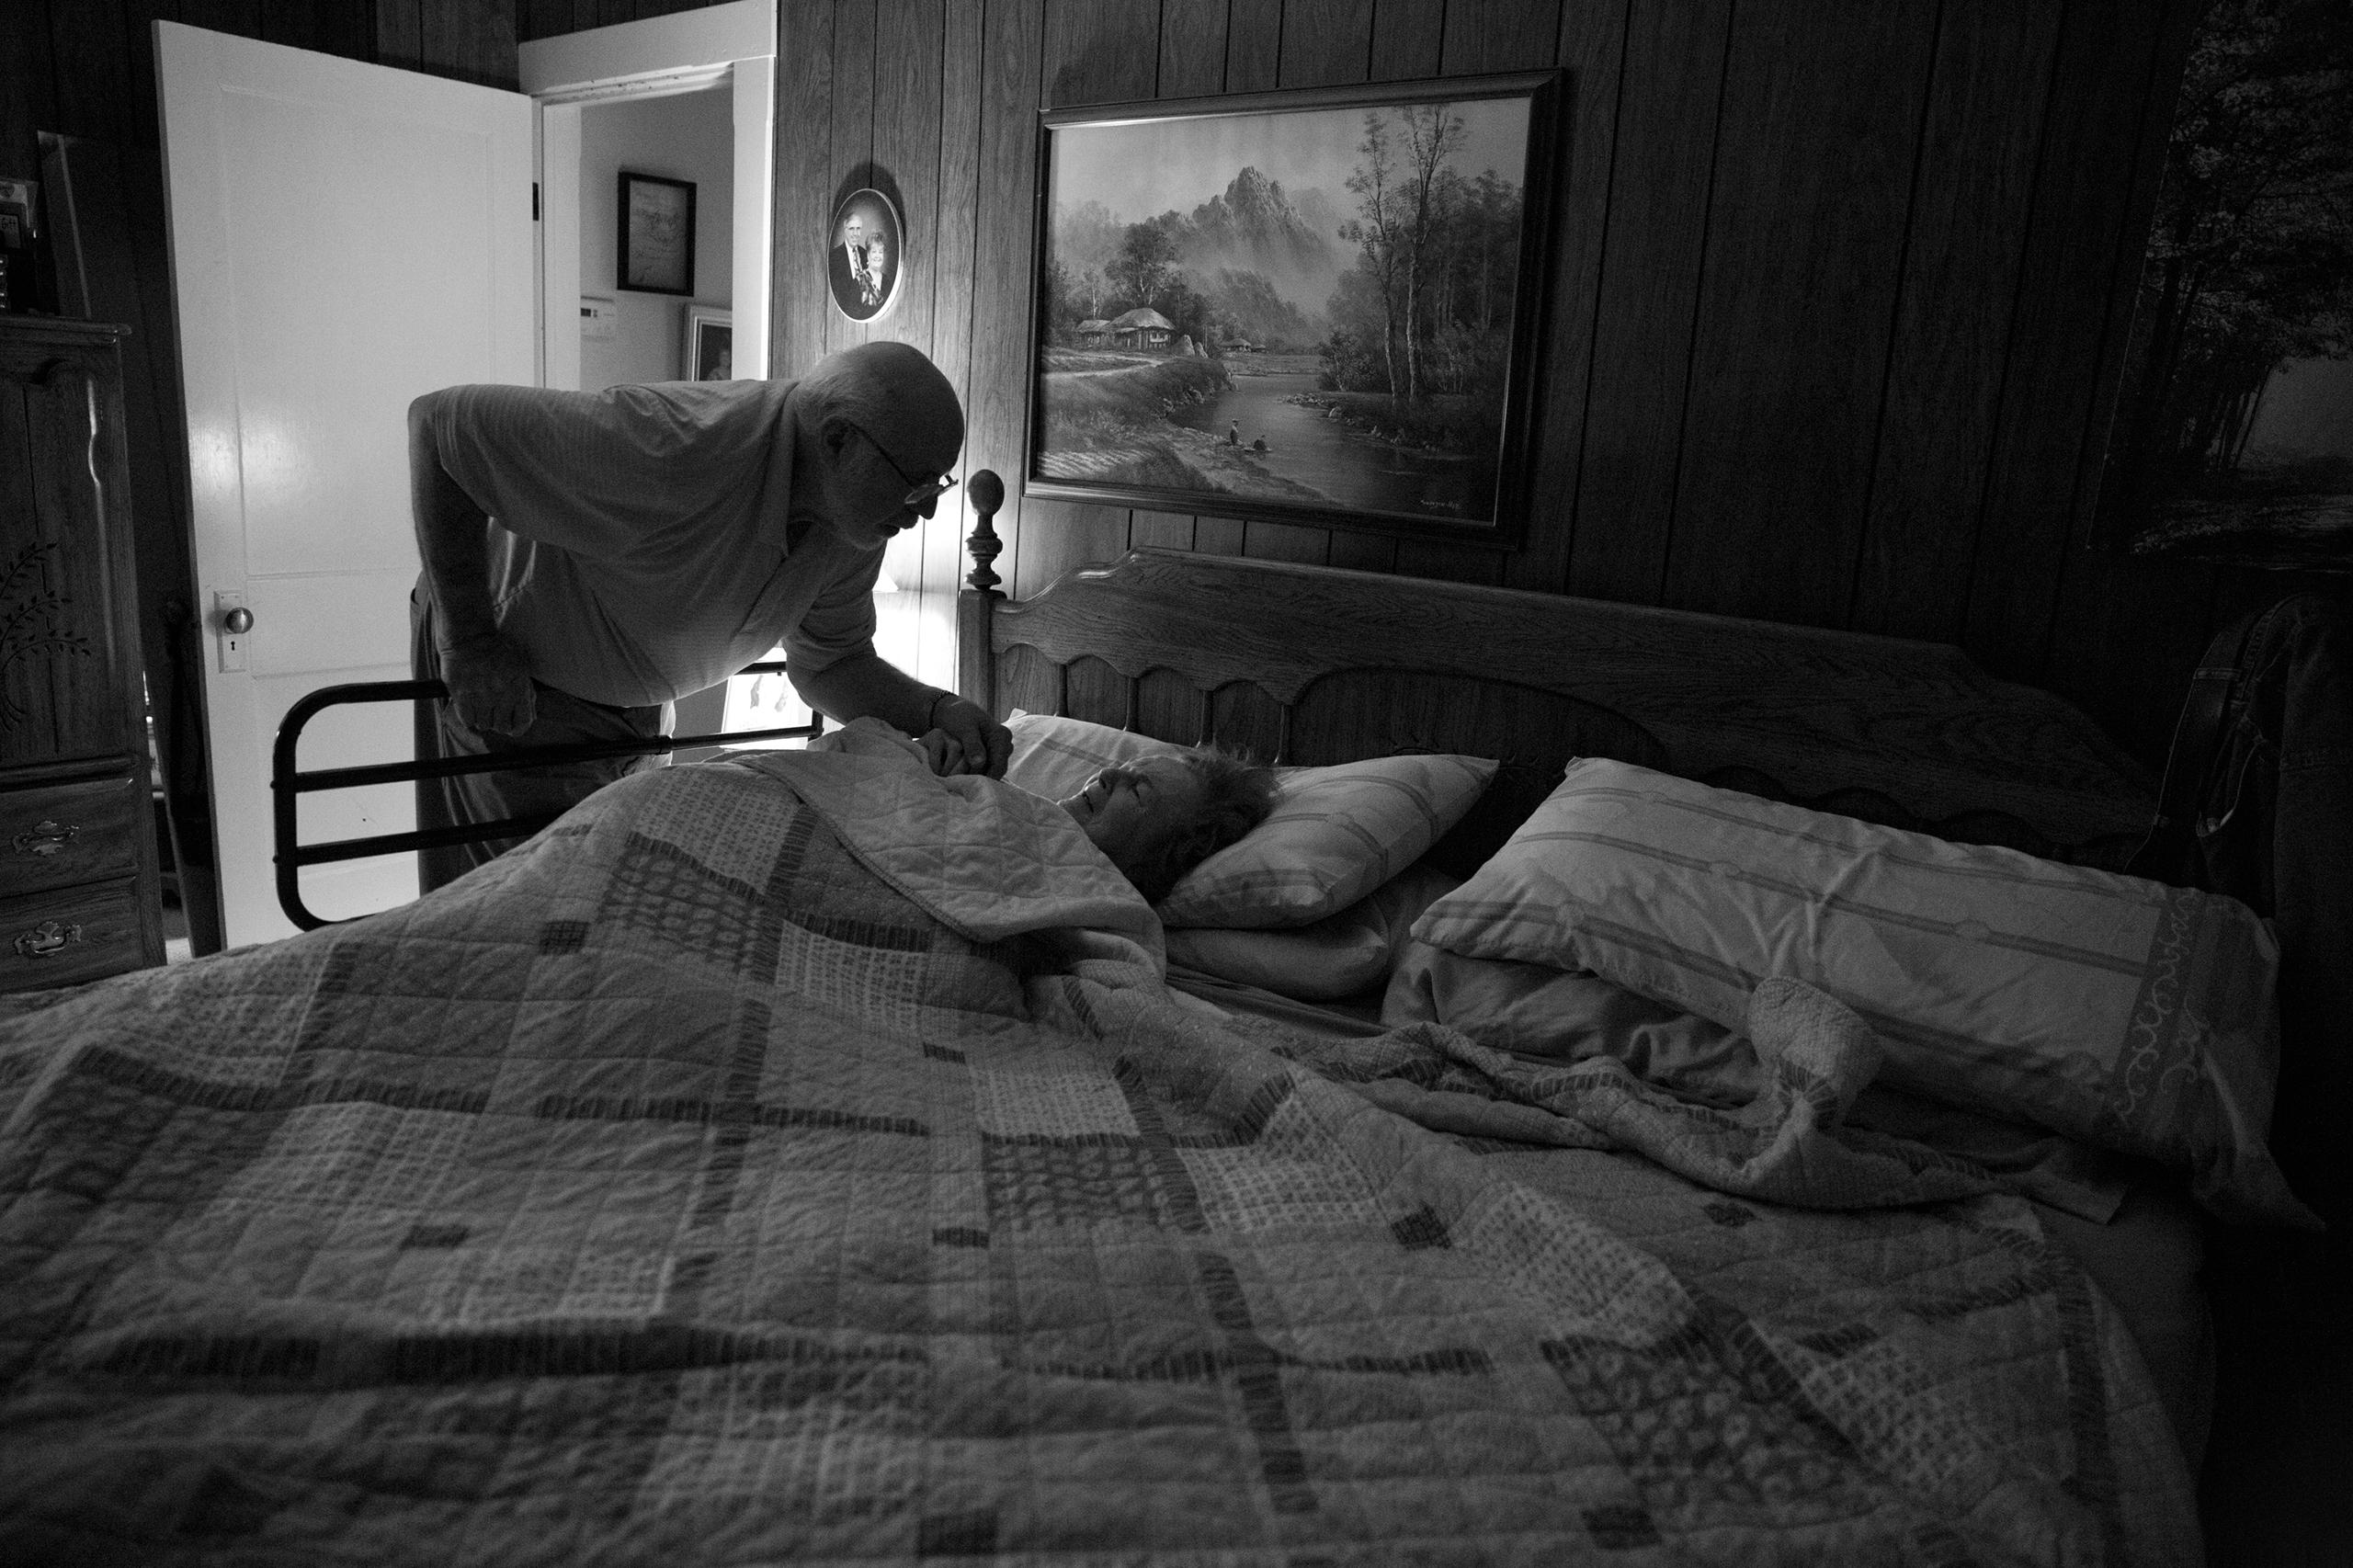 Ed comforts Karen in bed at night